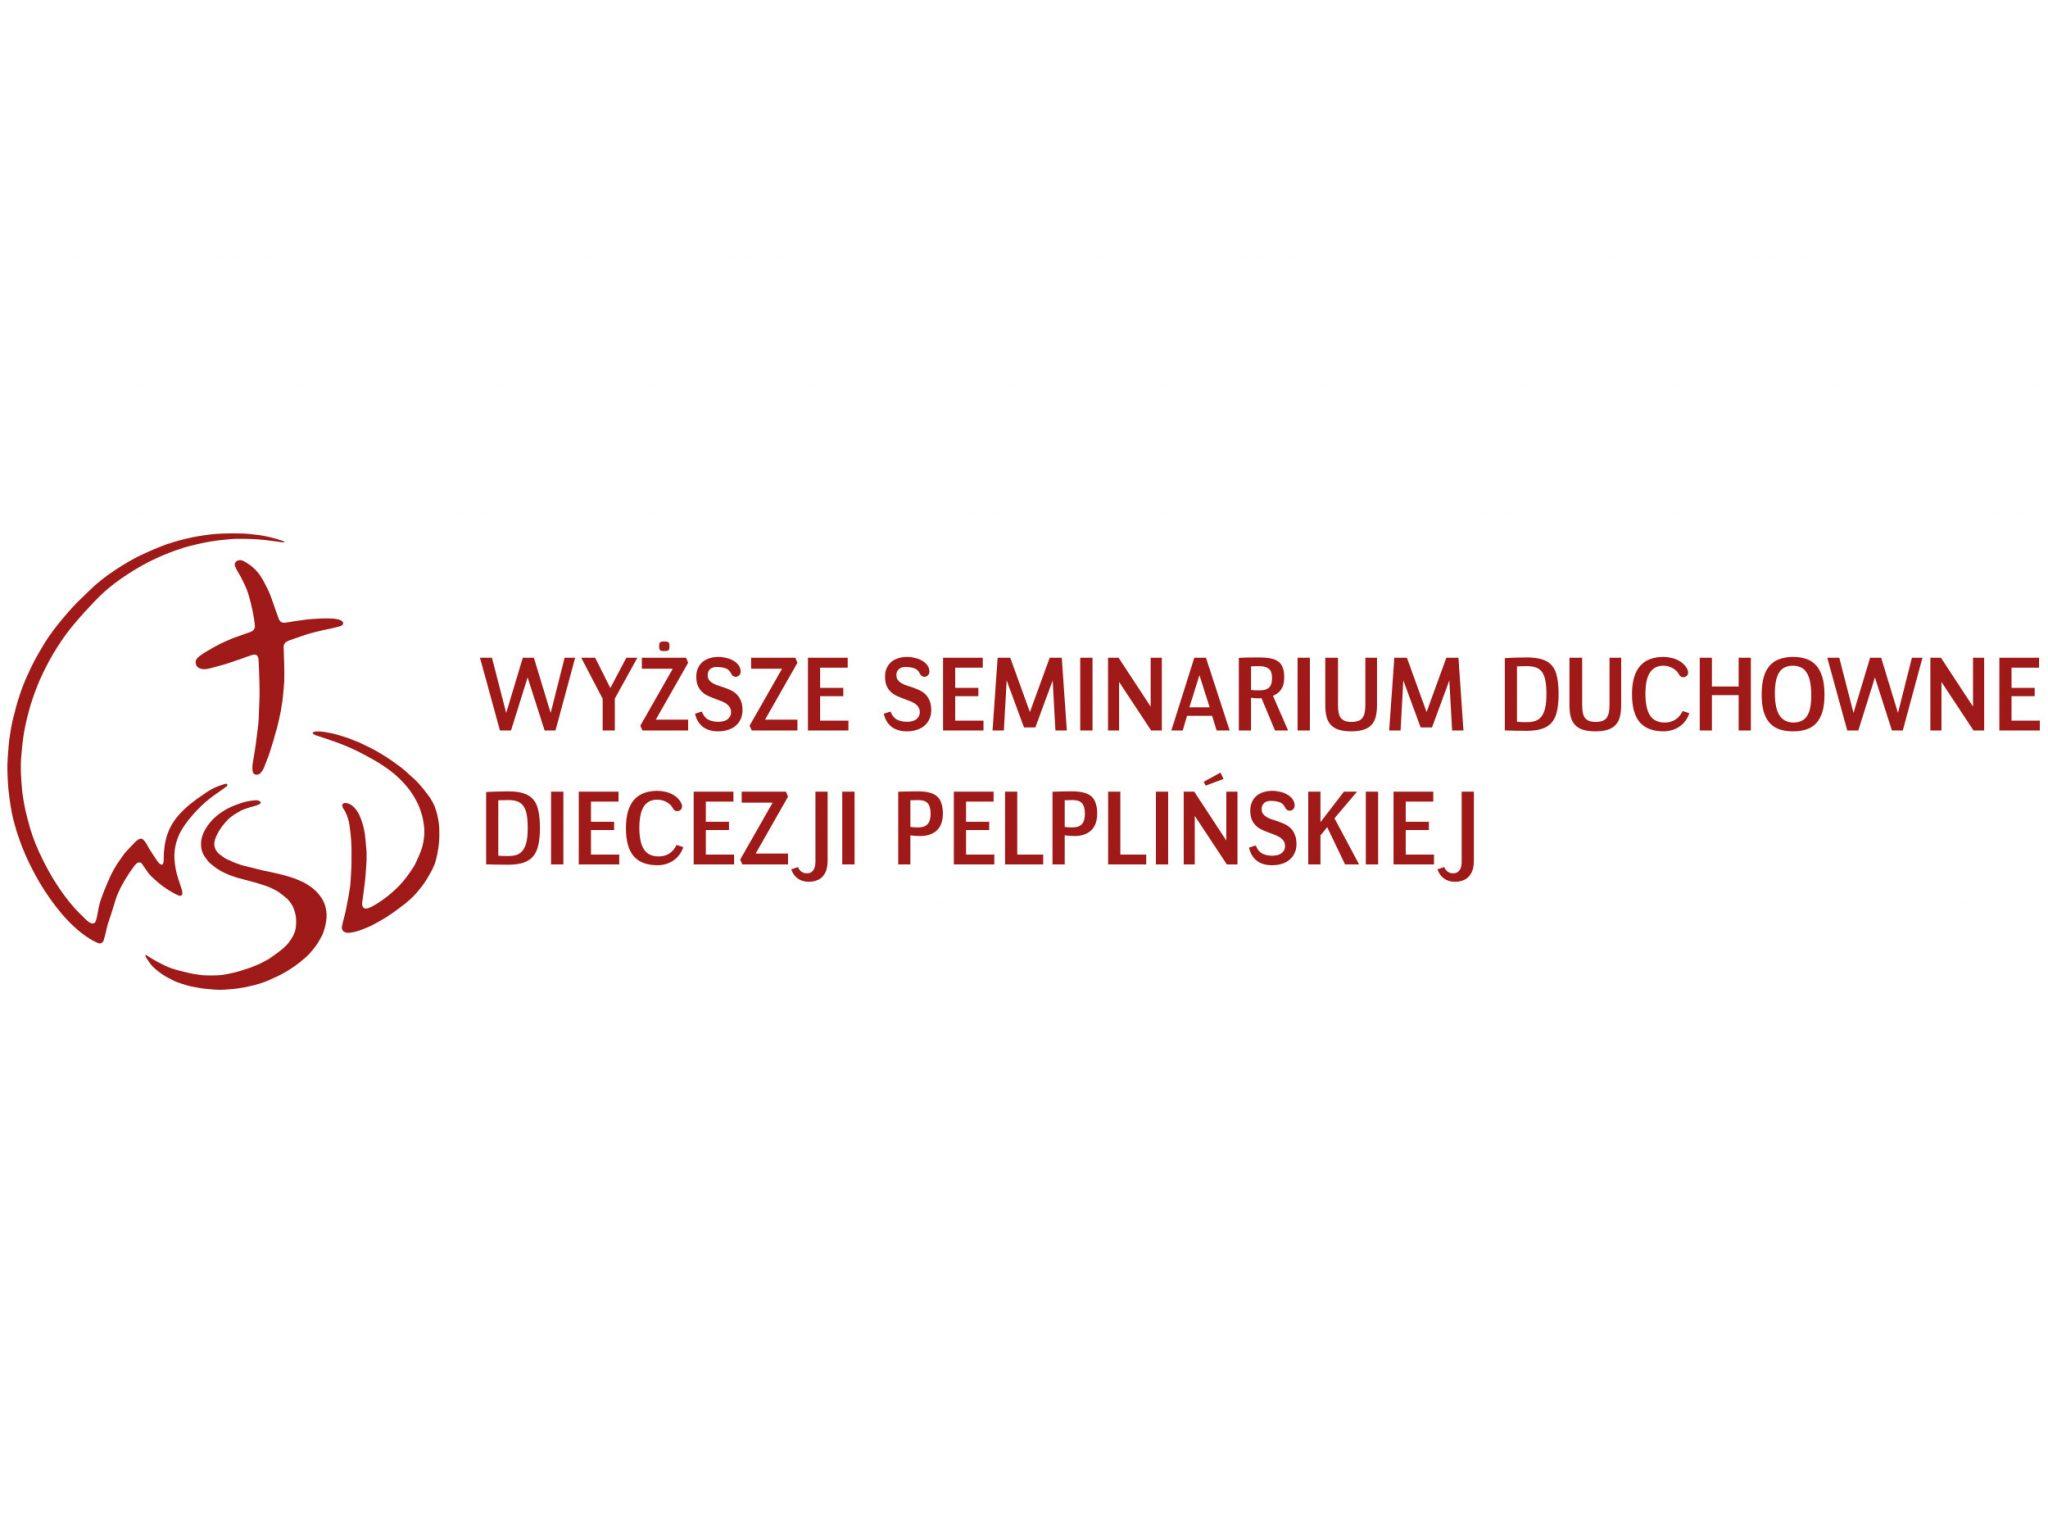 Nowe logo seminaryjne